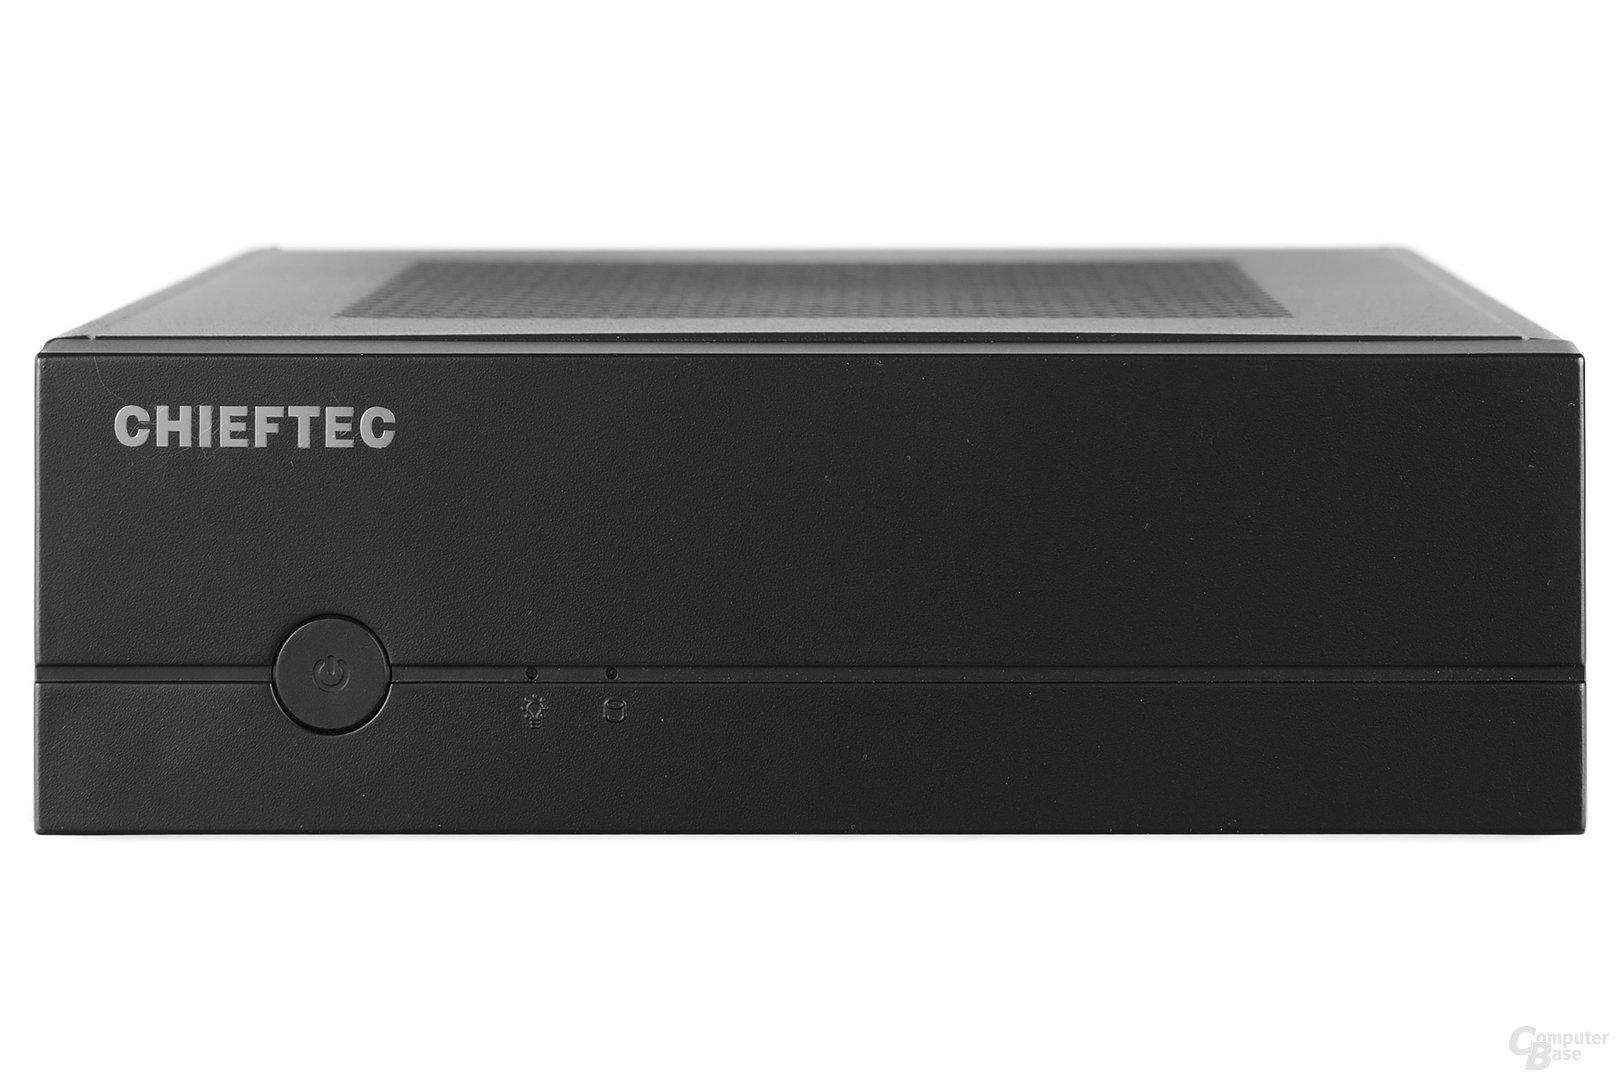 Chieftec IX-01B - Frontansicht